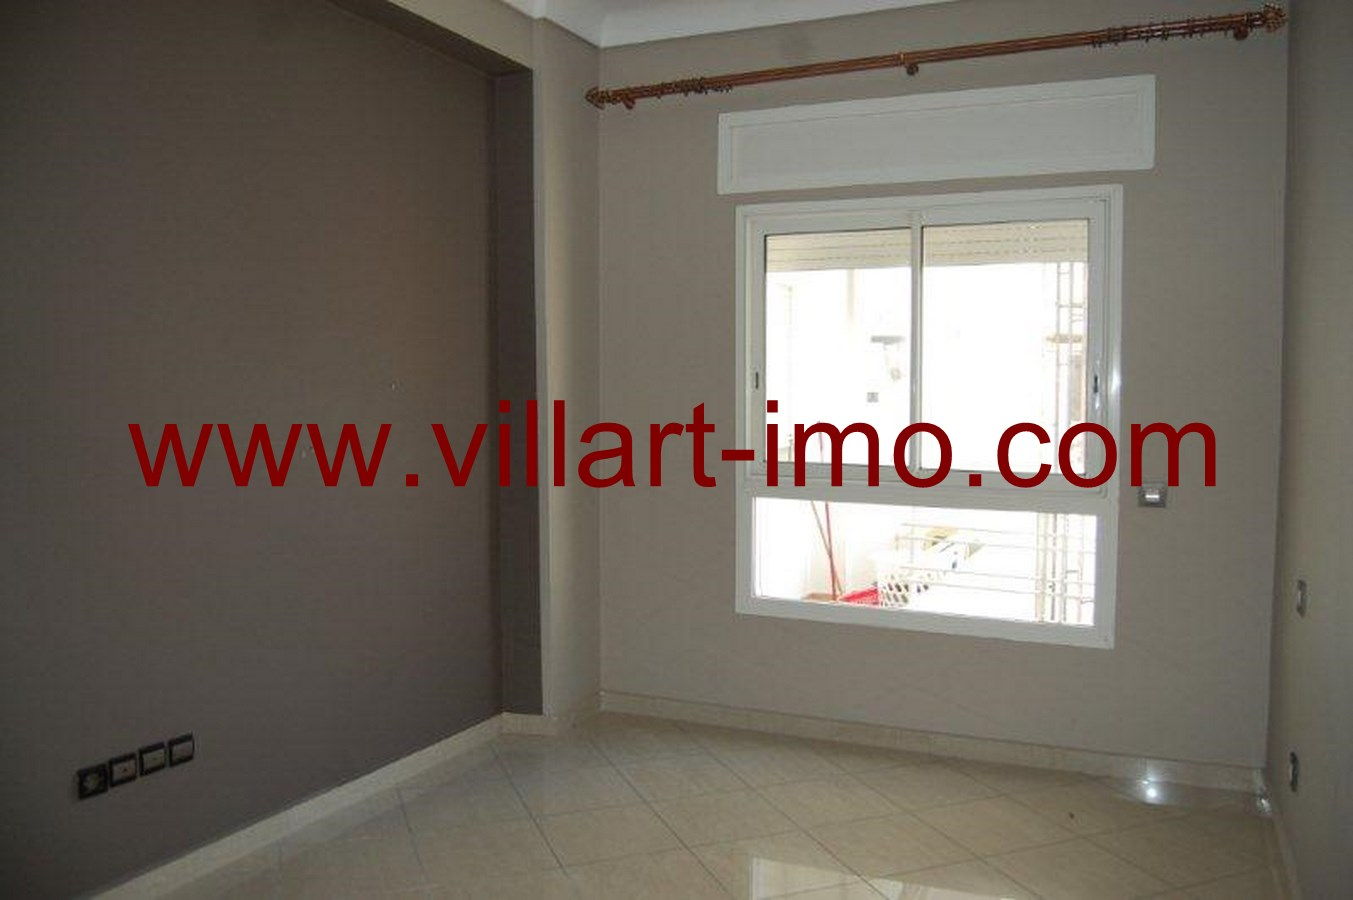 6-Location-Appartement-Non meublé-Tanger-Iberia-Chambre 1'-L484-Villart immo